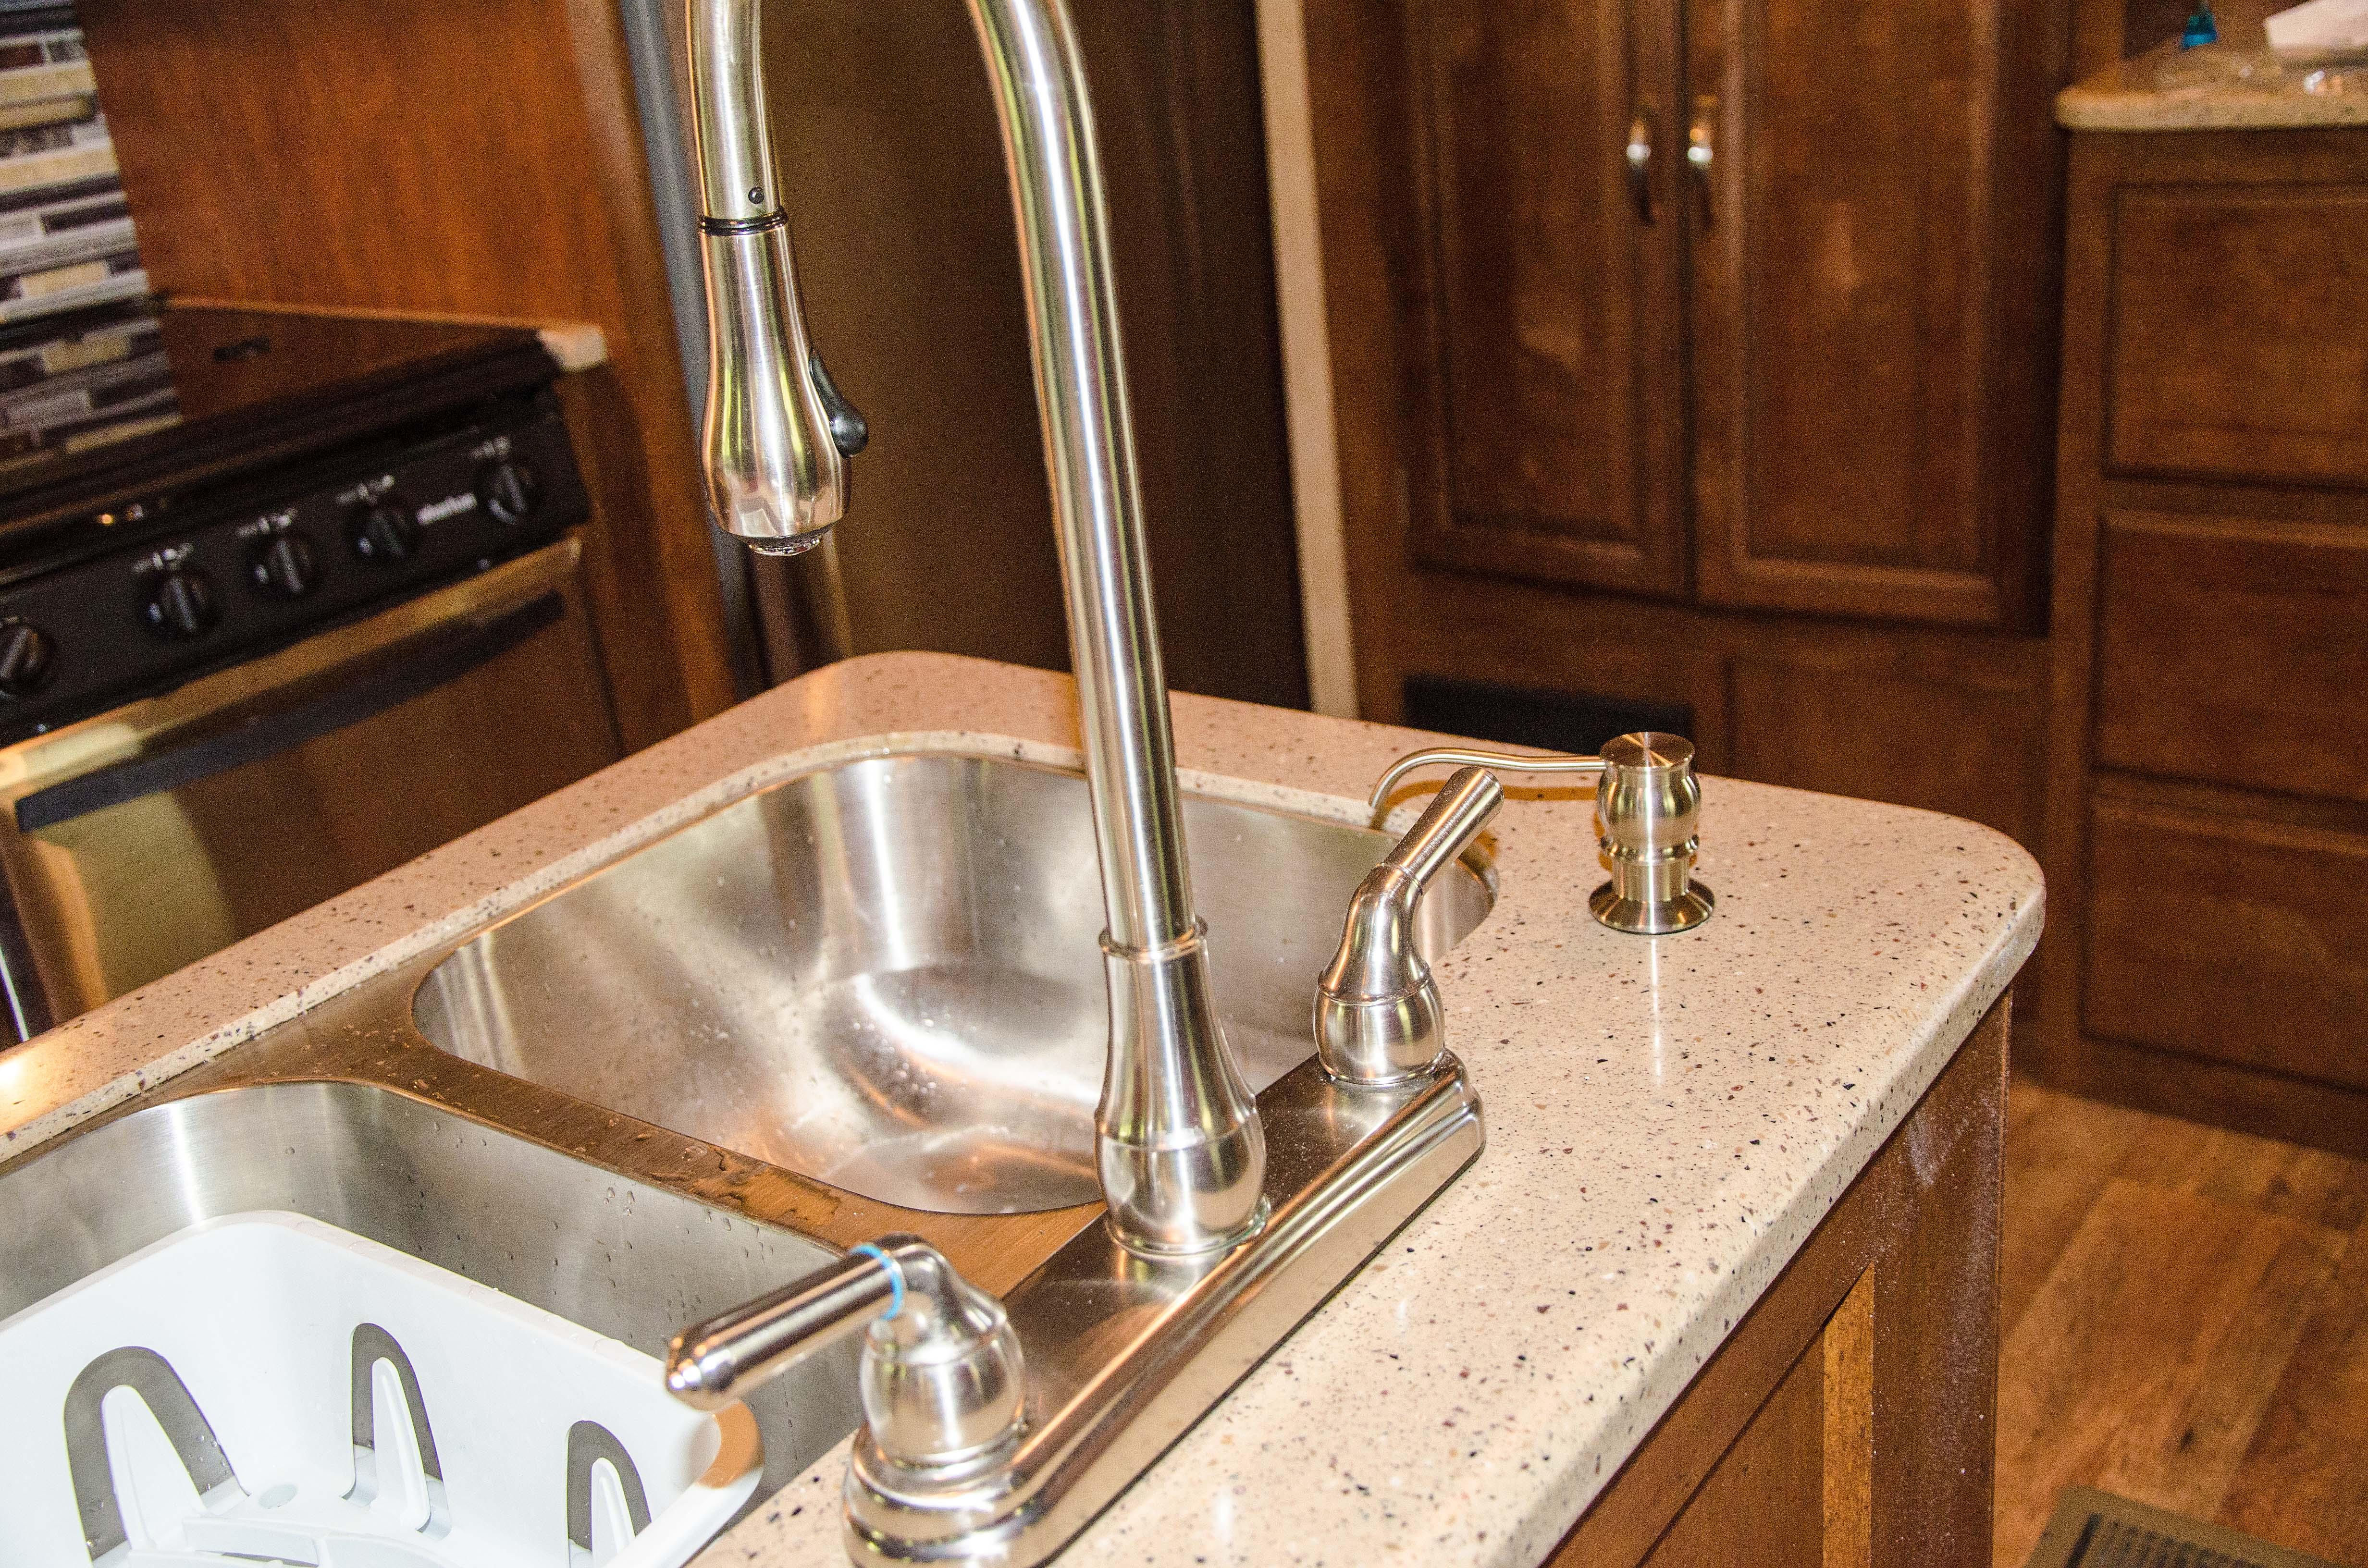 Rv soap dispenser installed at the kitchen sink